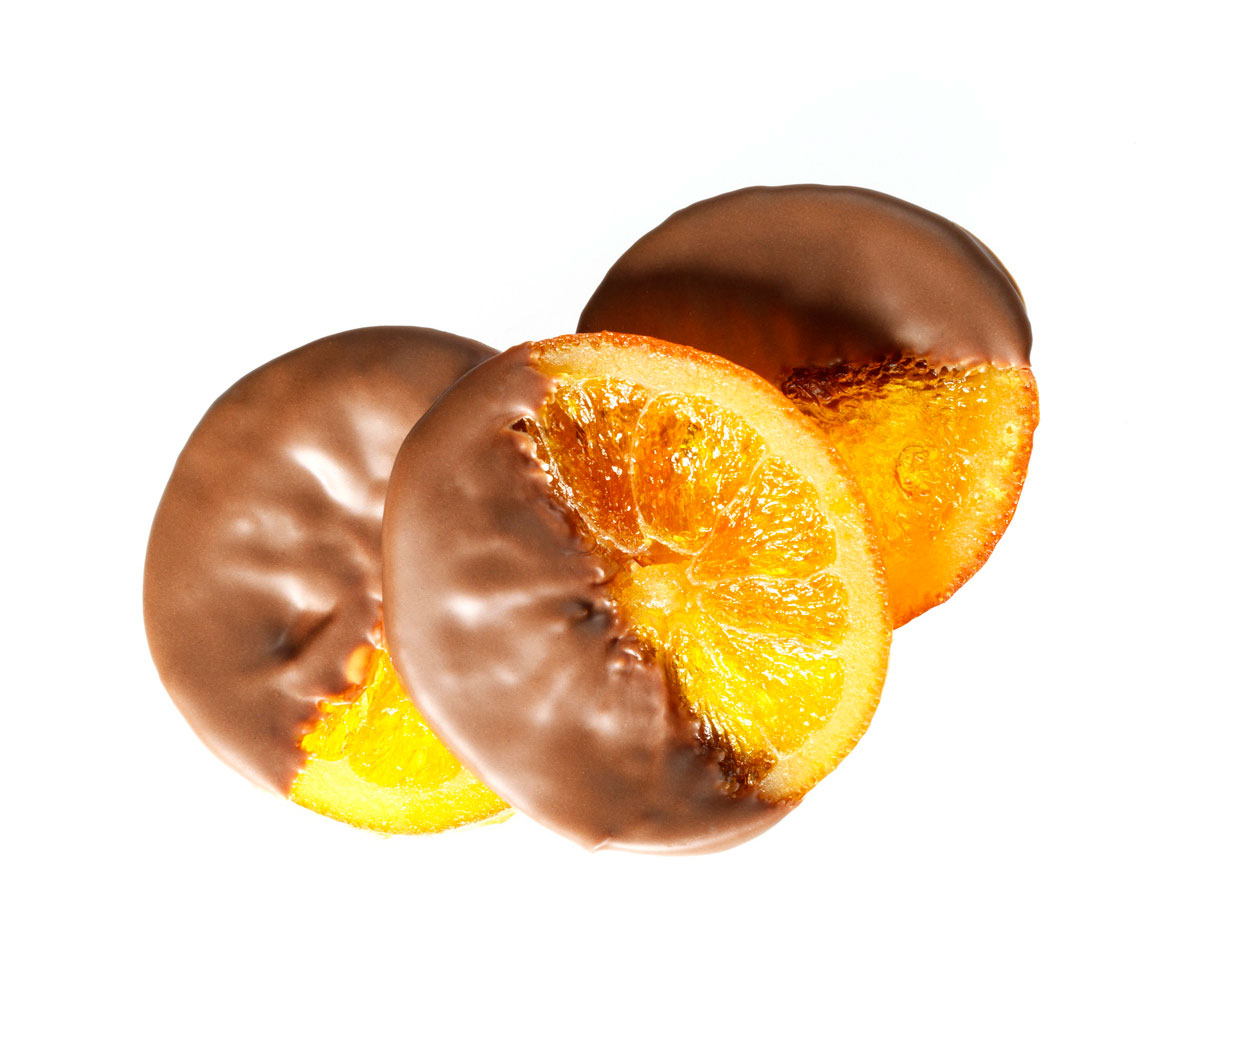 Dipped orange slices | DUVA Choc-O-Fruits - Cerisettes - Orangettes